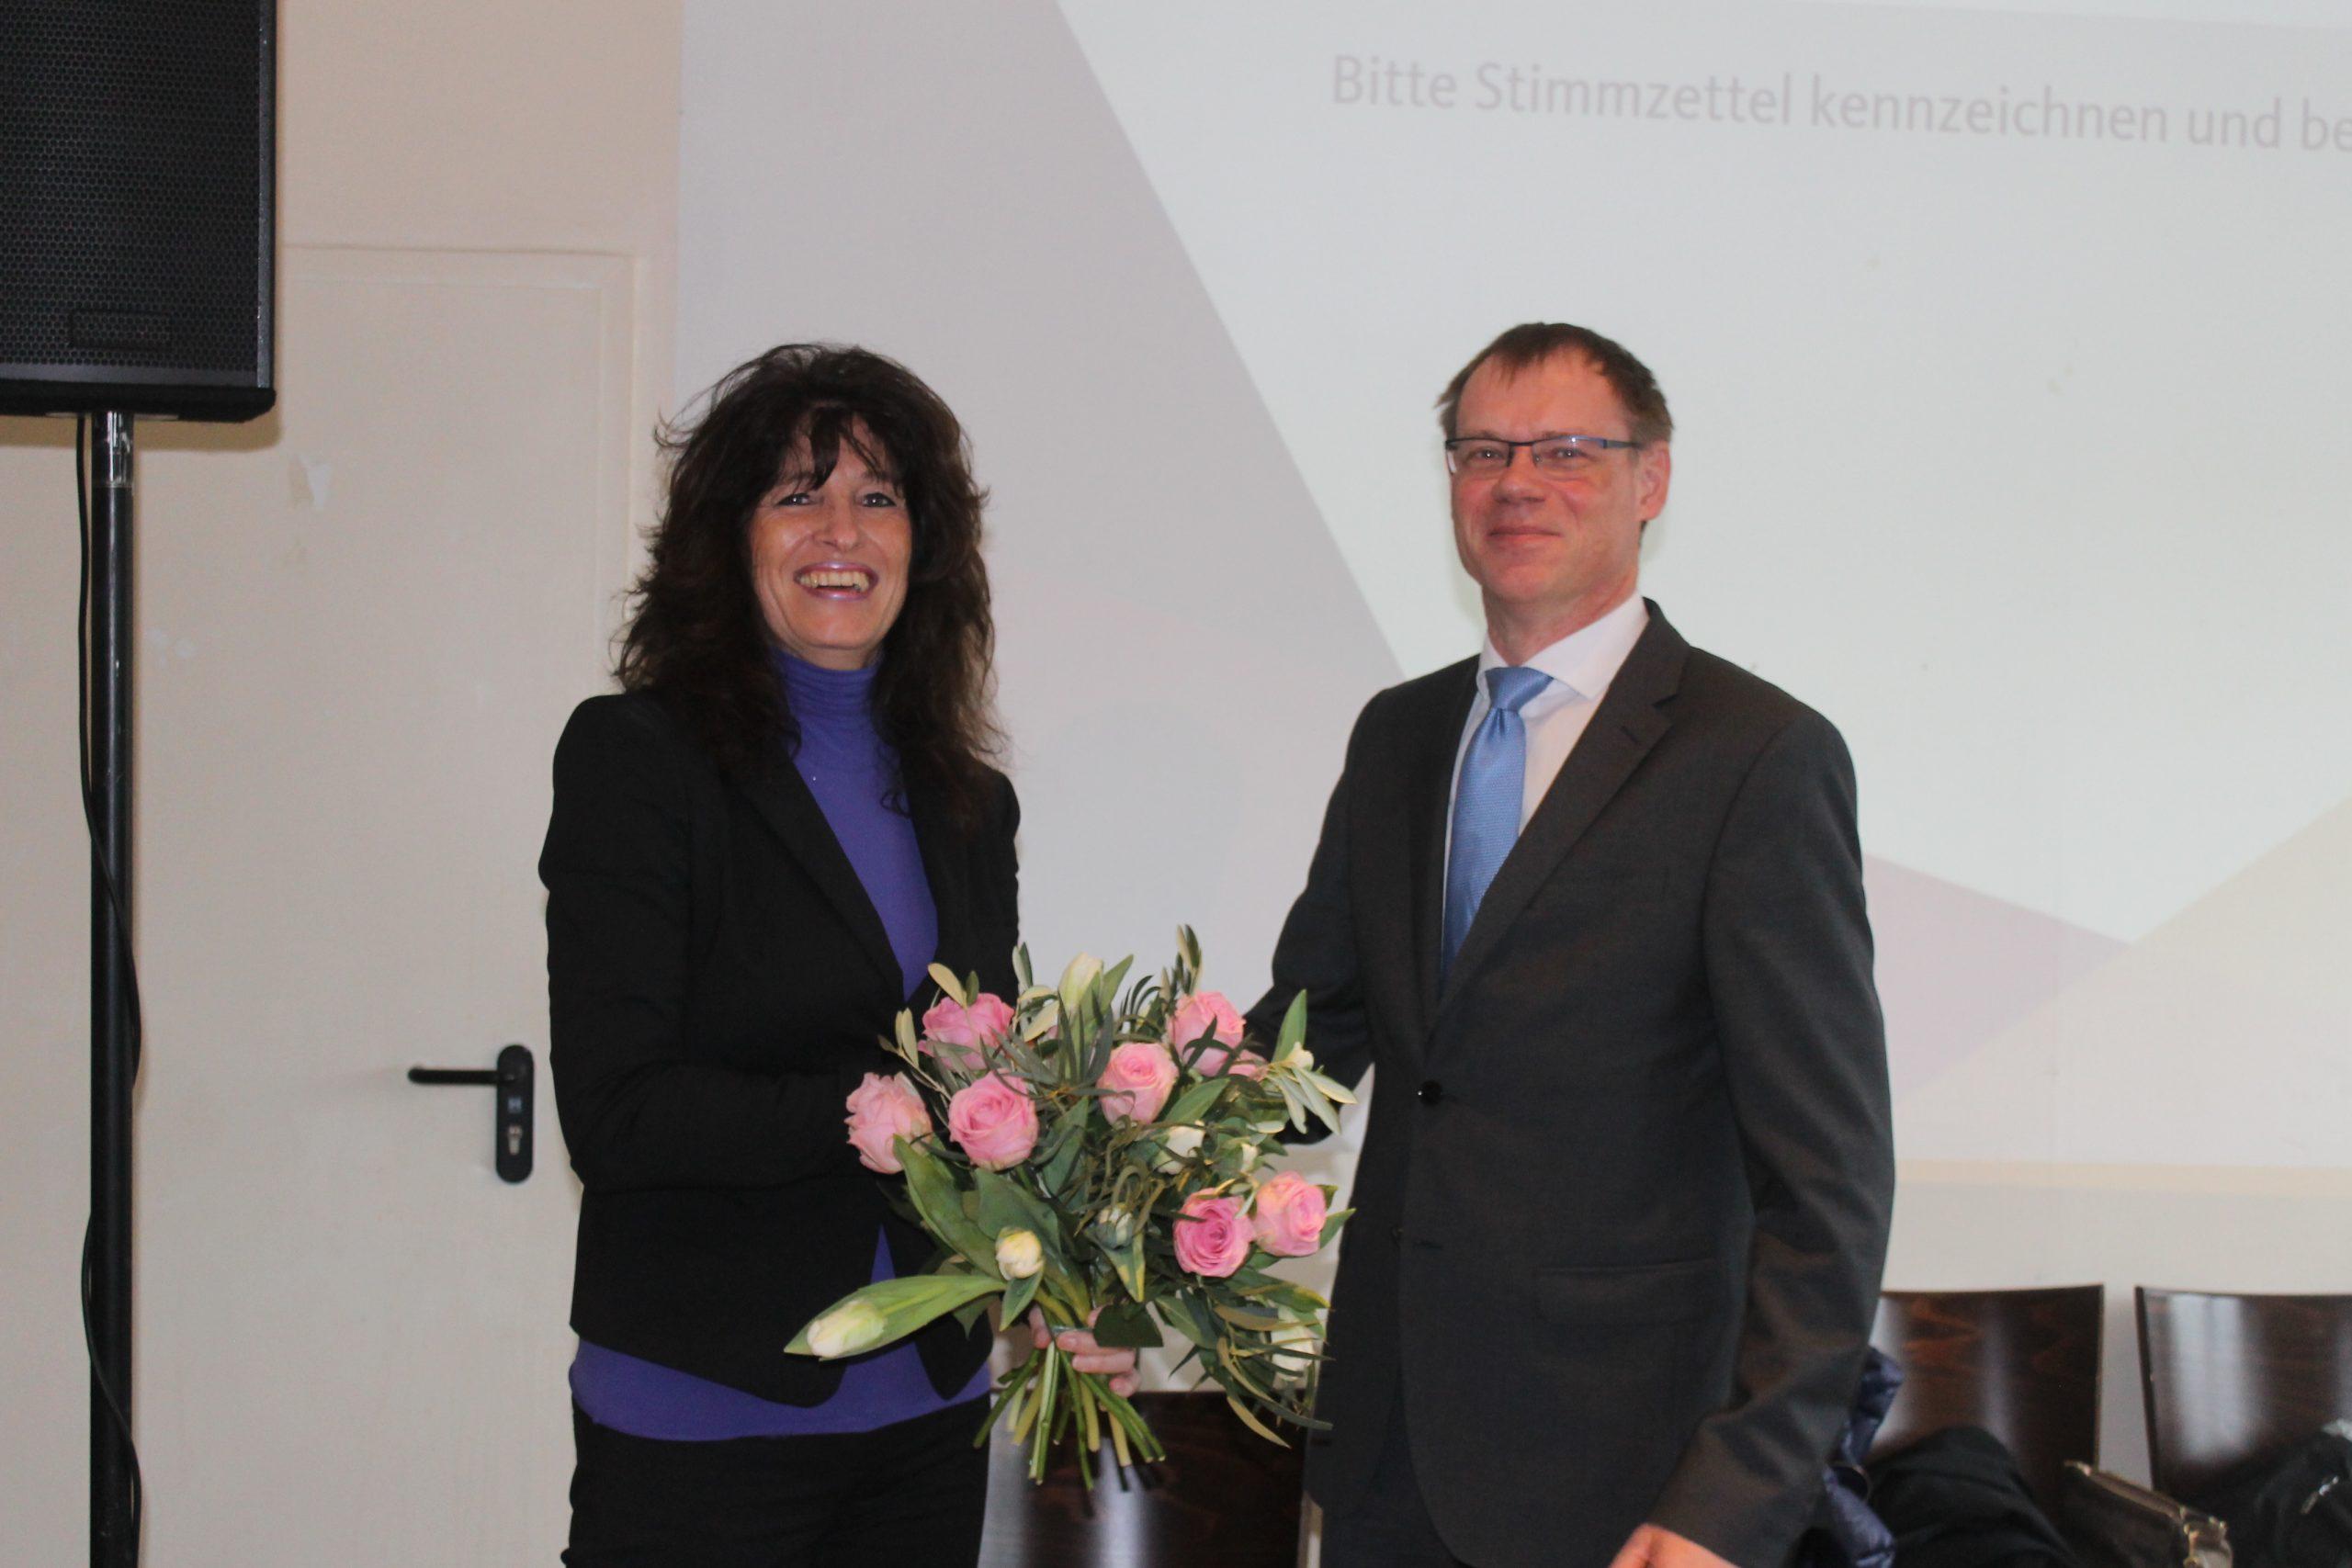 Sabine Noll zur Bürgermeisterkandidatin gewählt